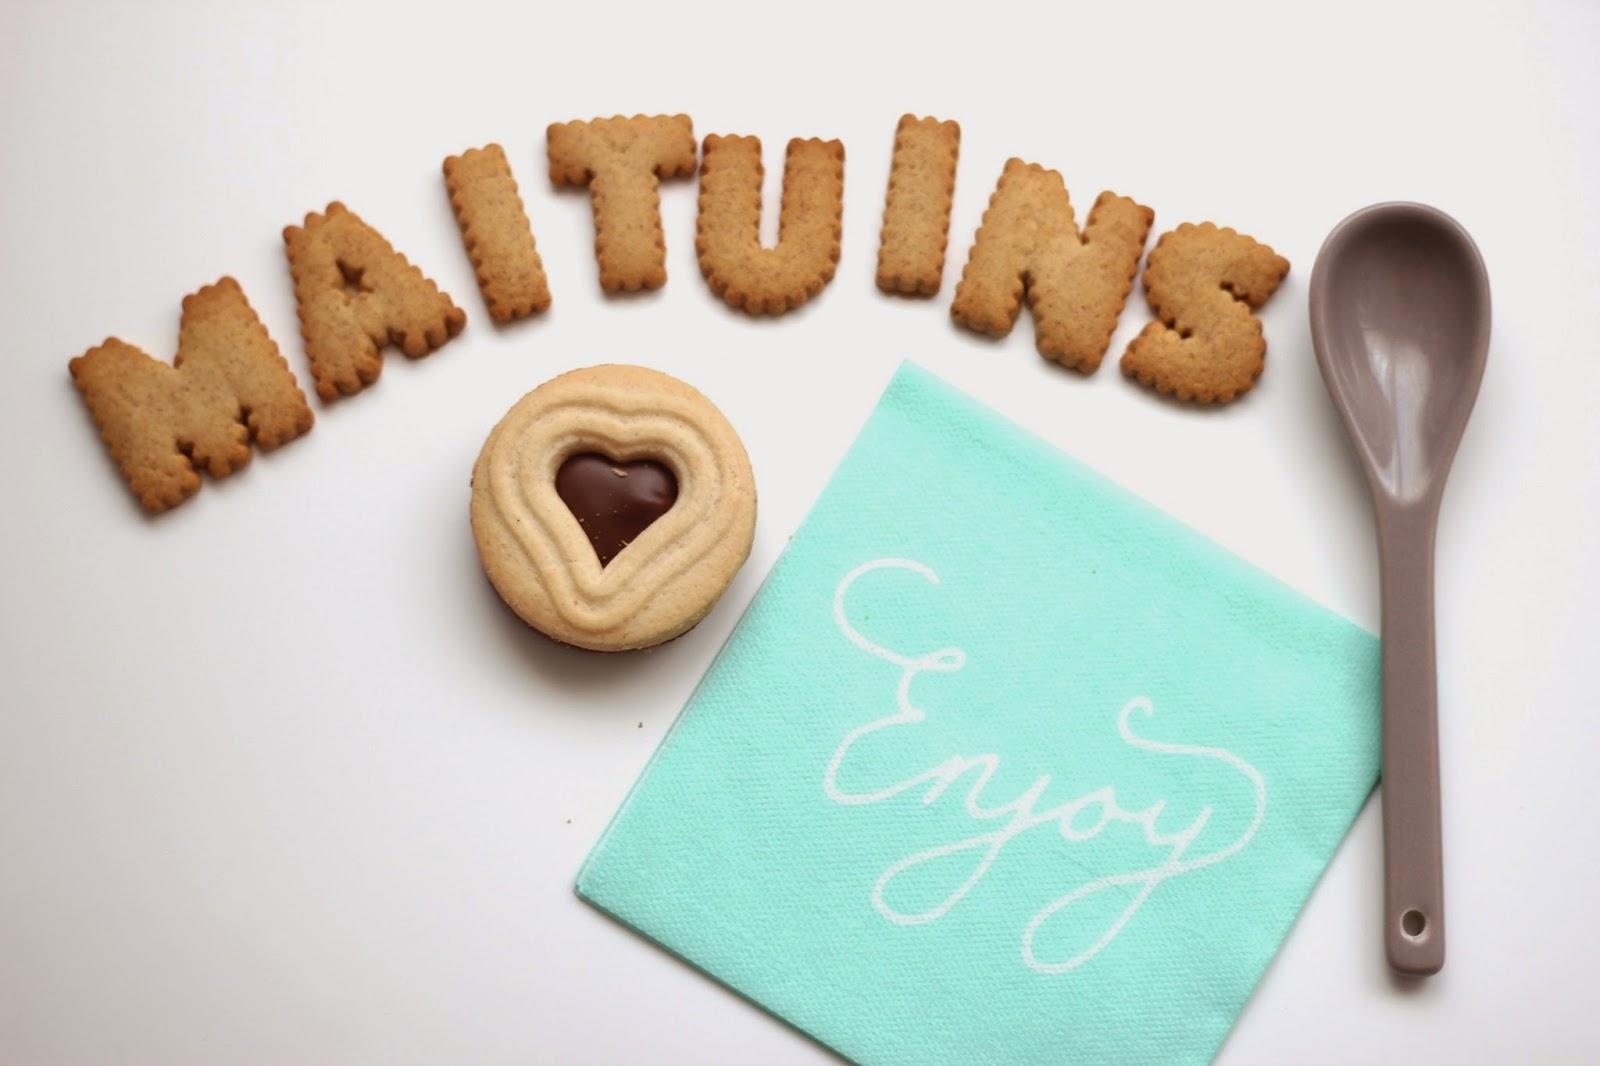 Maituins mai different things for Letras decoracion ikea